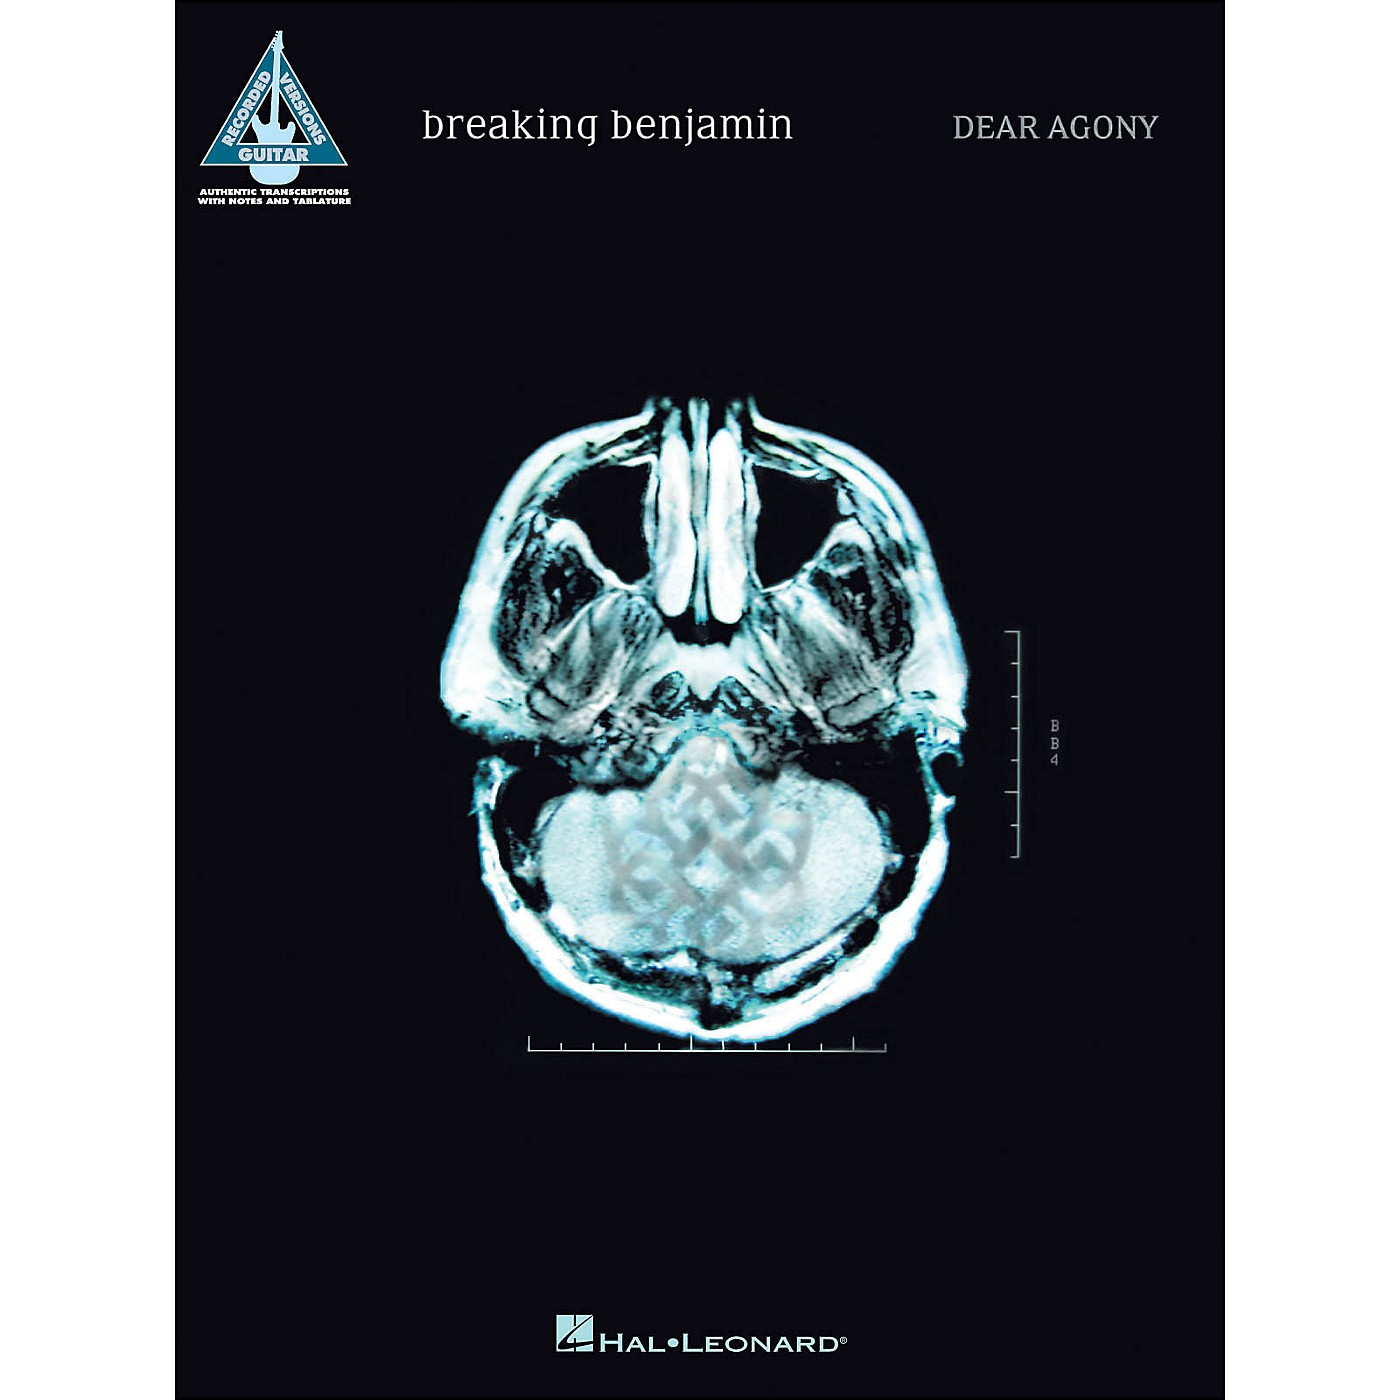 Hal Leonard Breaking Benjamin - Dear Agony Guitar Tab Songbook thumbnail